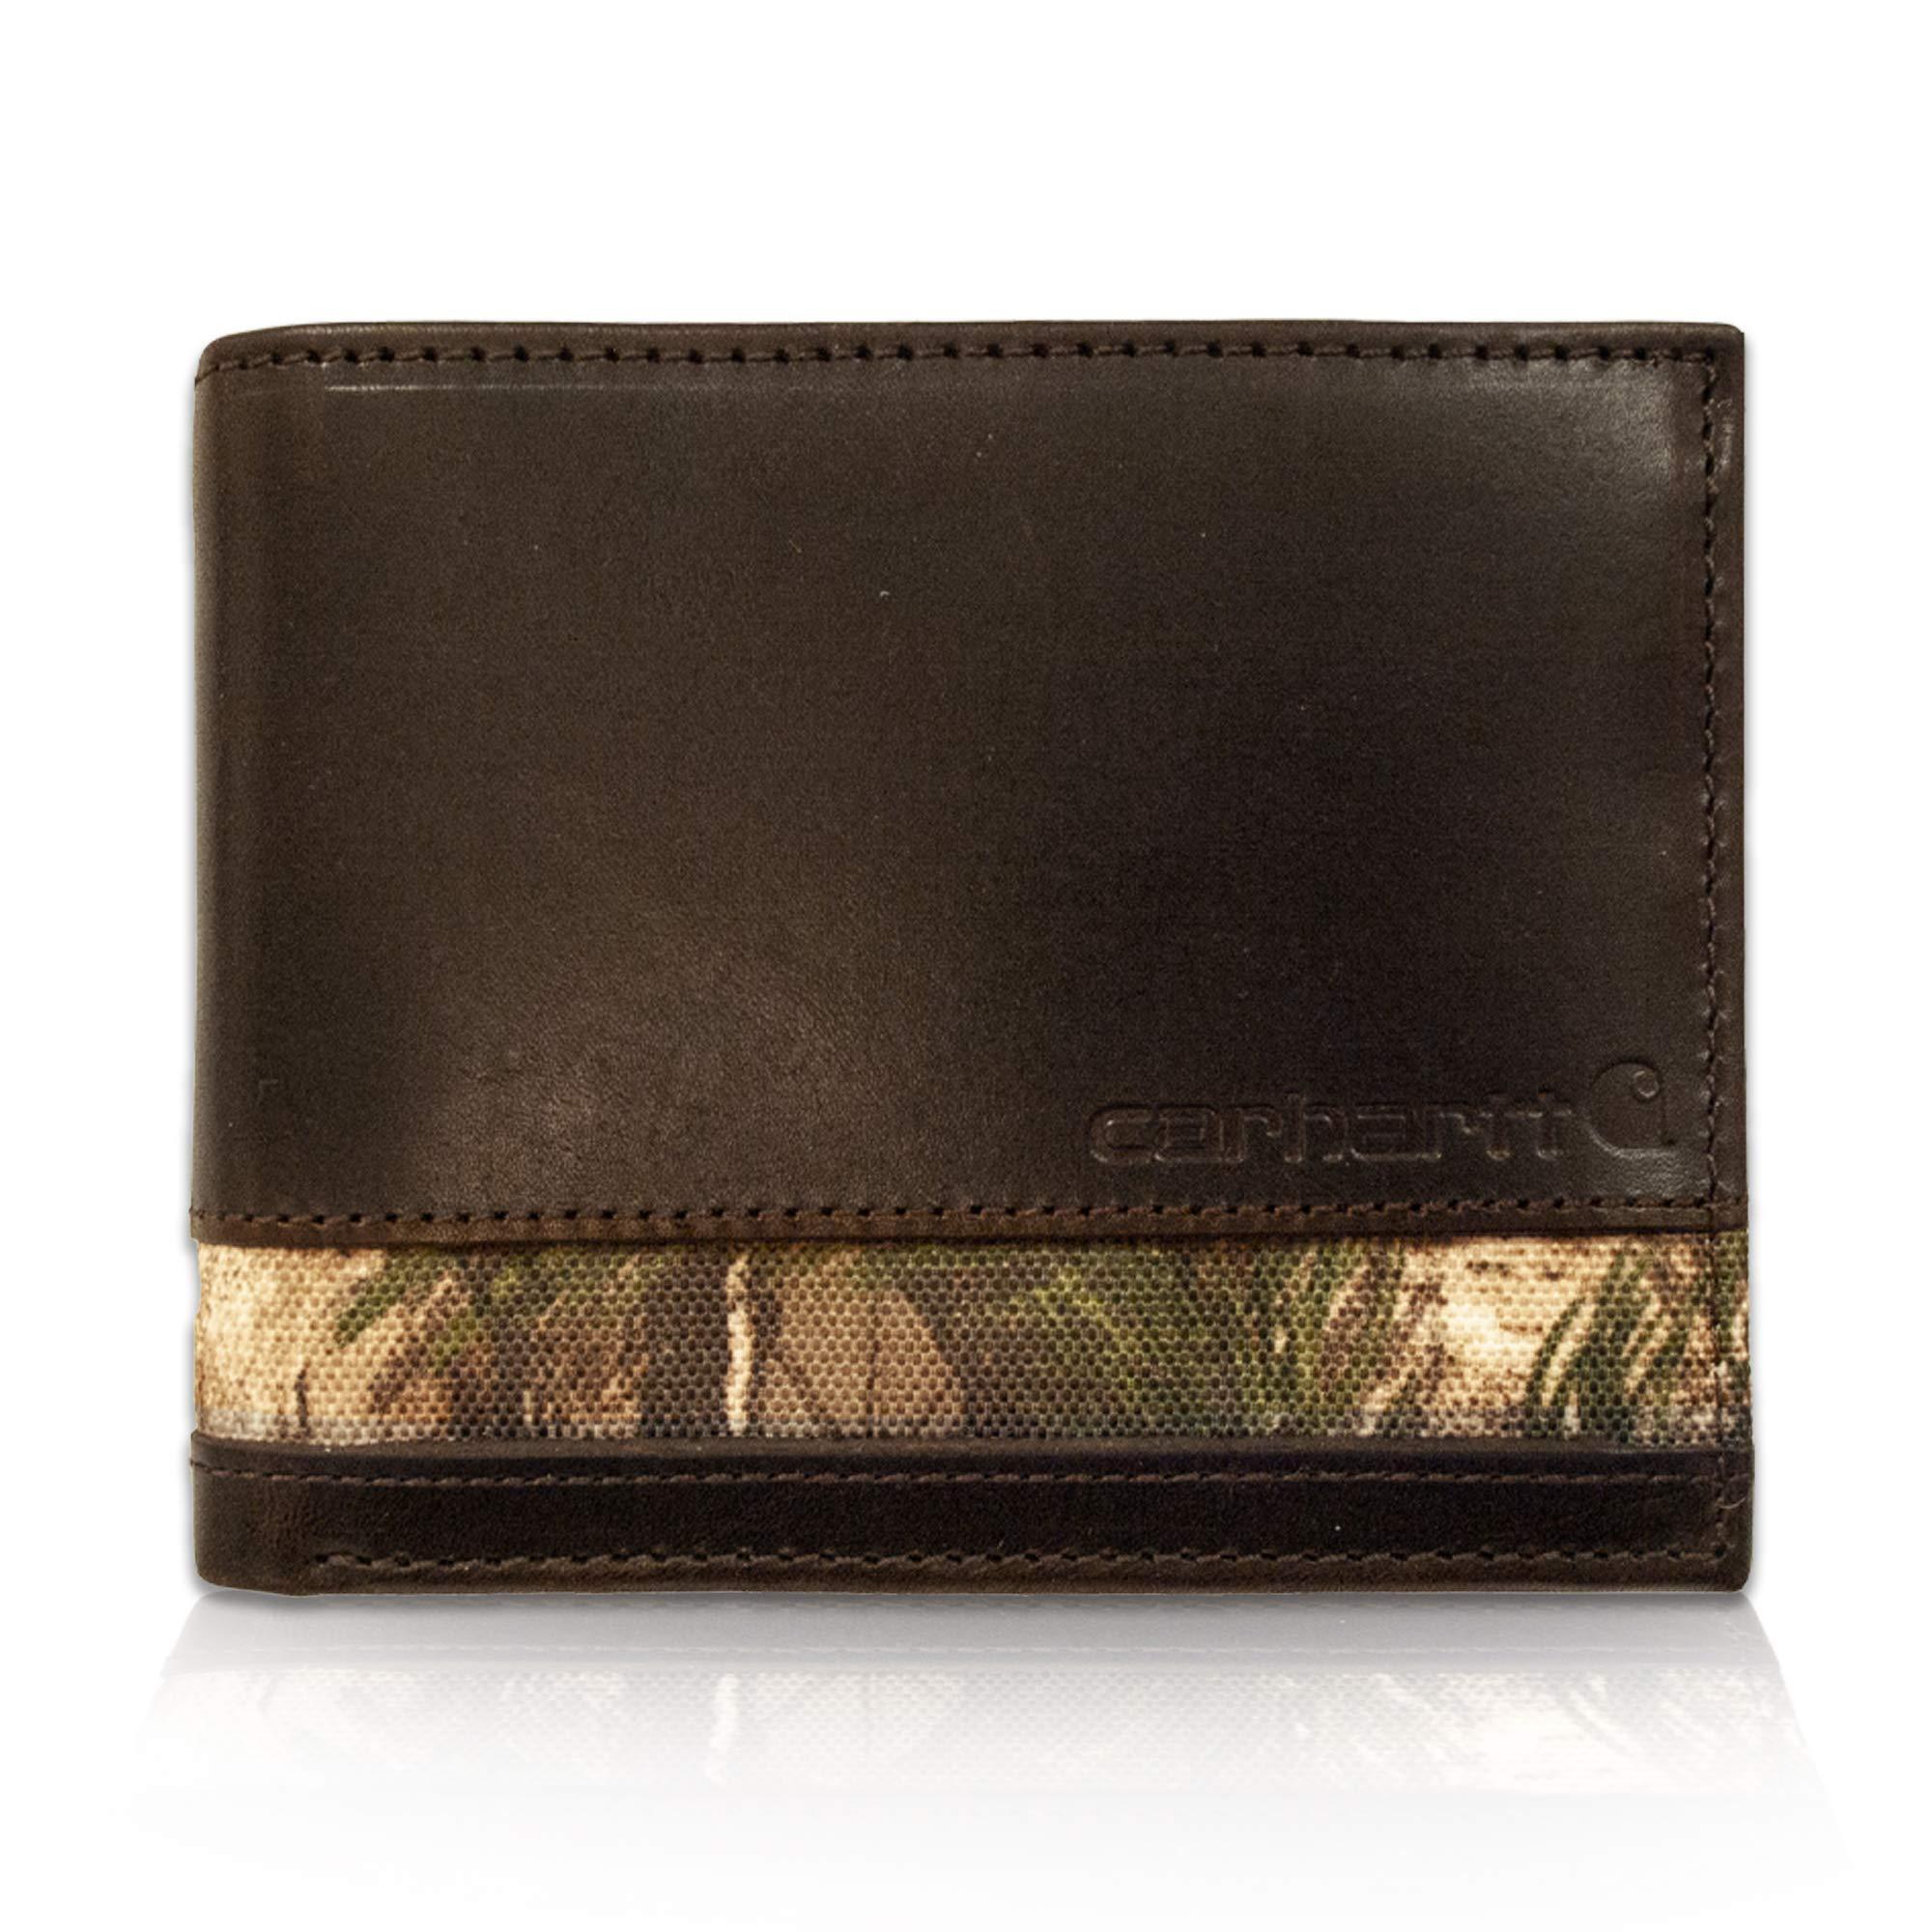 Carhartt Men's Billfold Wallet, sandoken Brown One Size